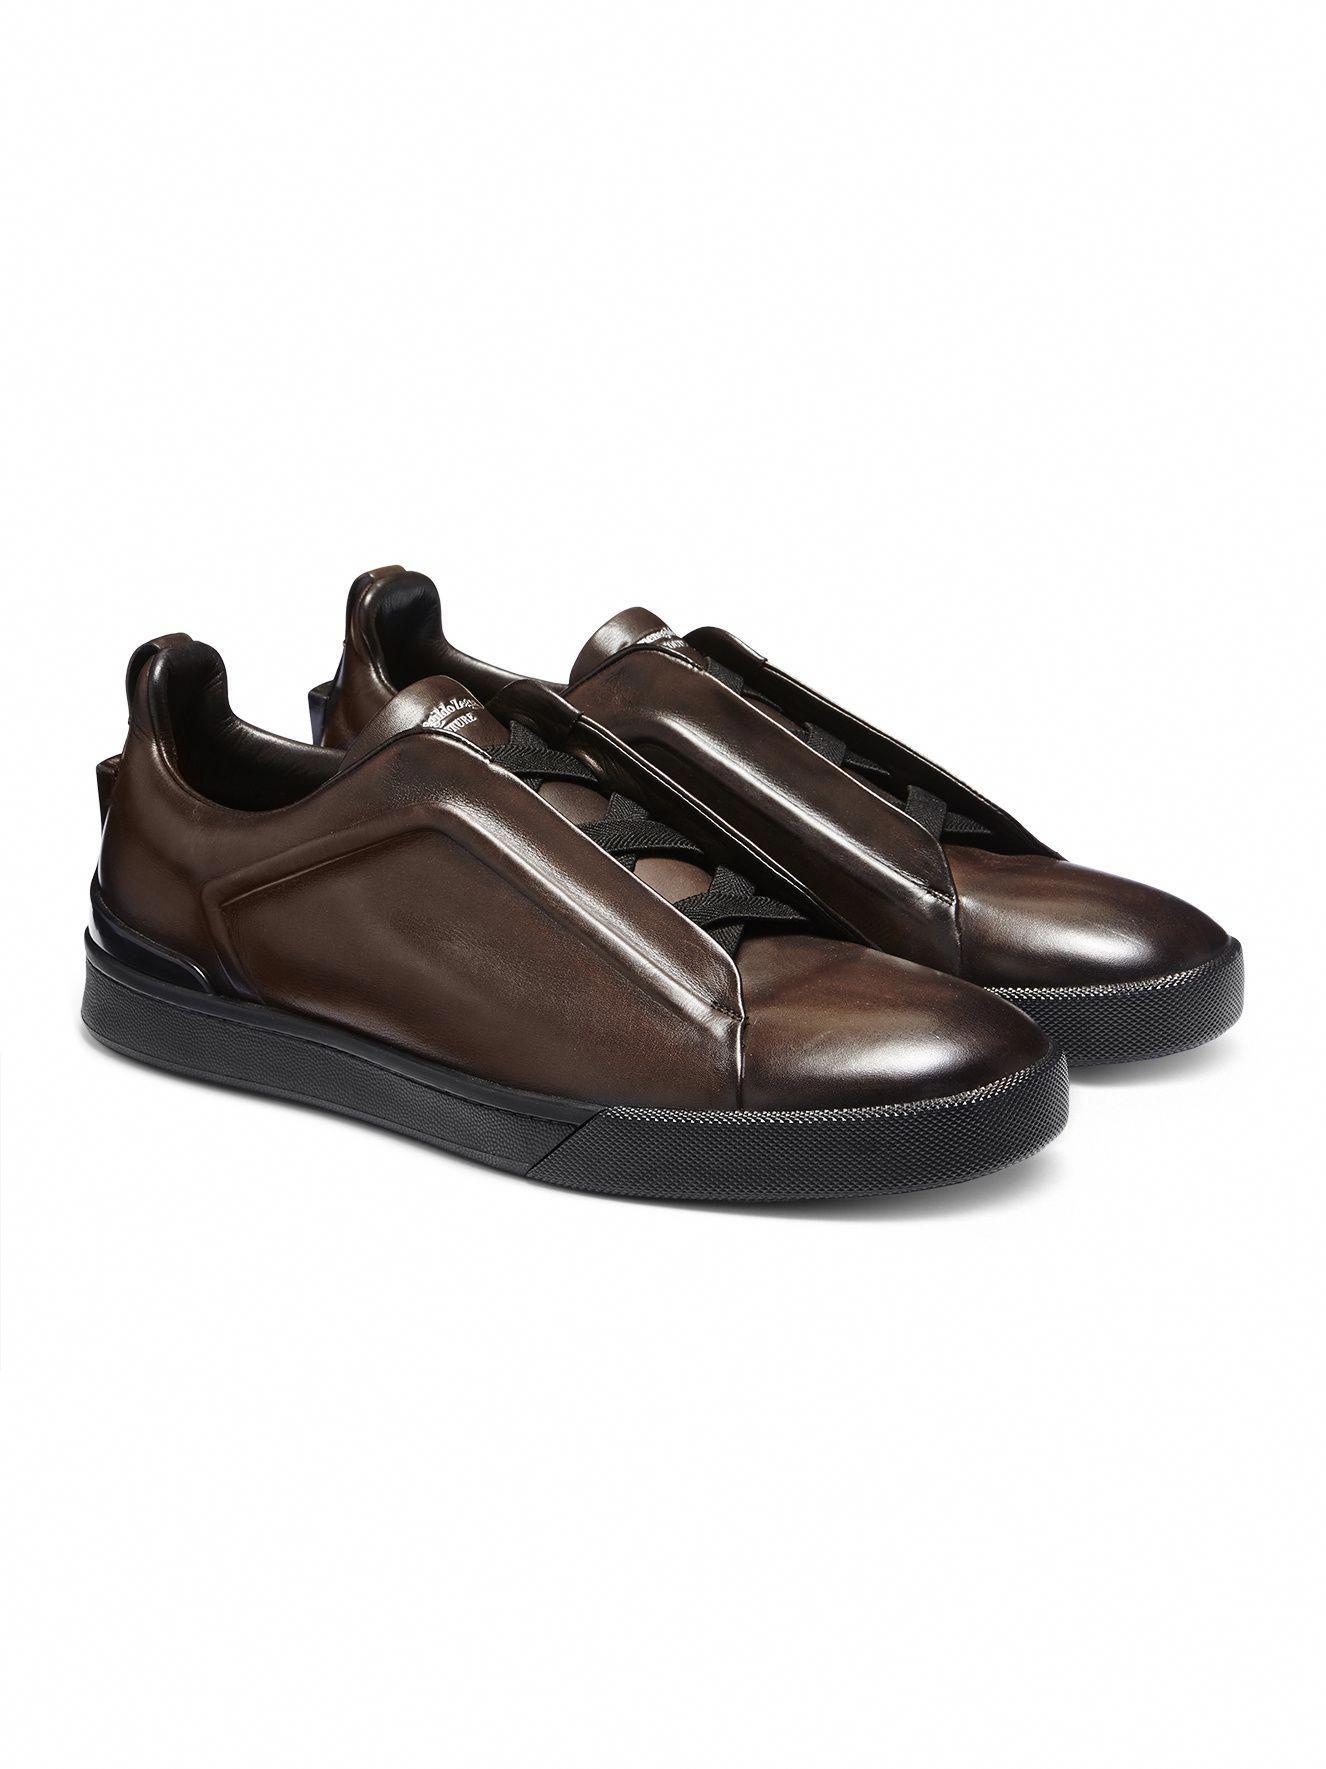 22d5bab6 Triple Stitch Slip-on Sneaker FW16 9896026 | Zegna #Sneakers | Mens ...